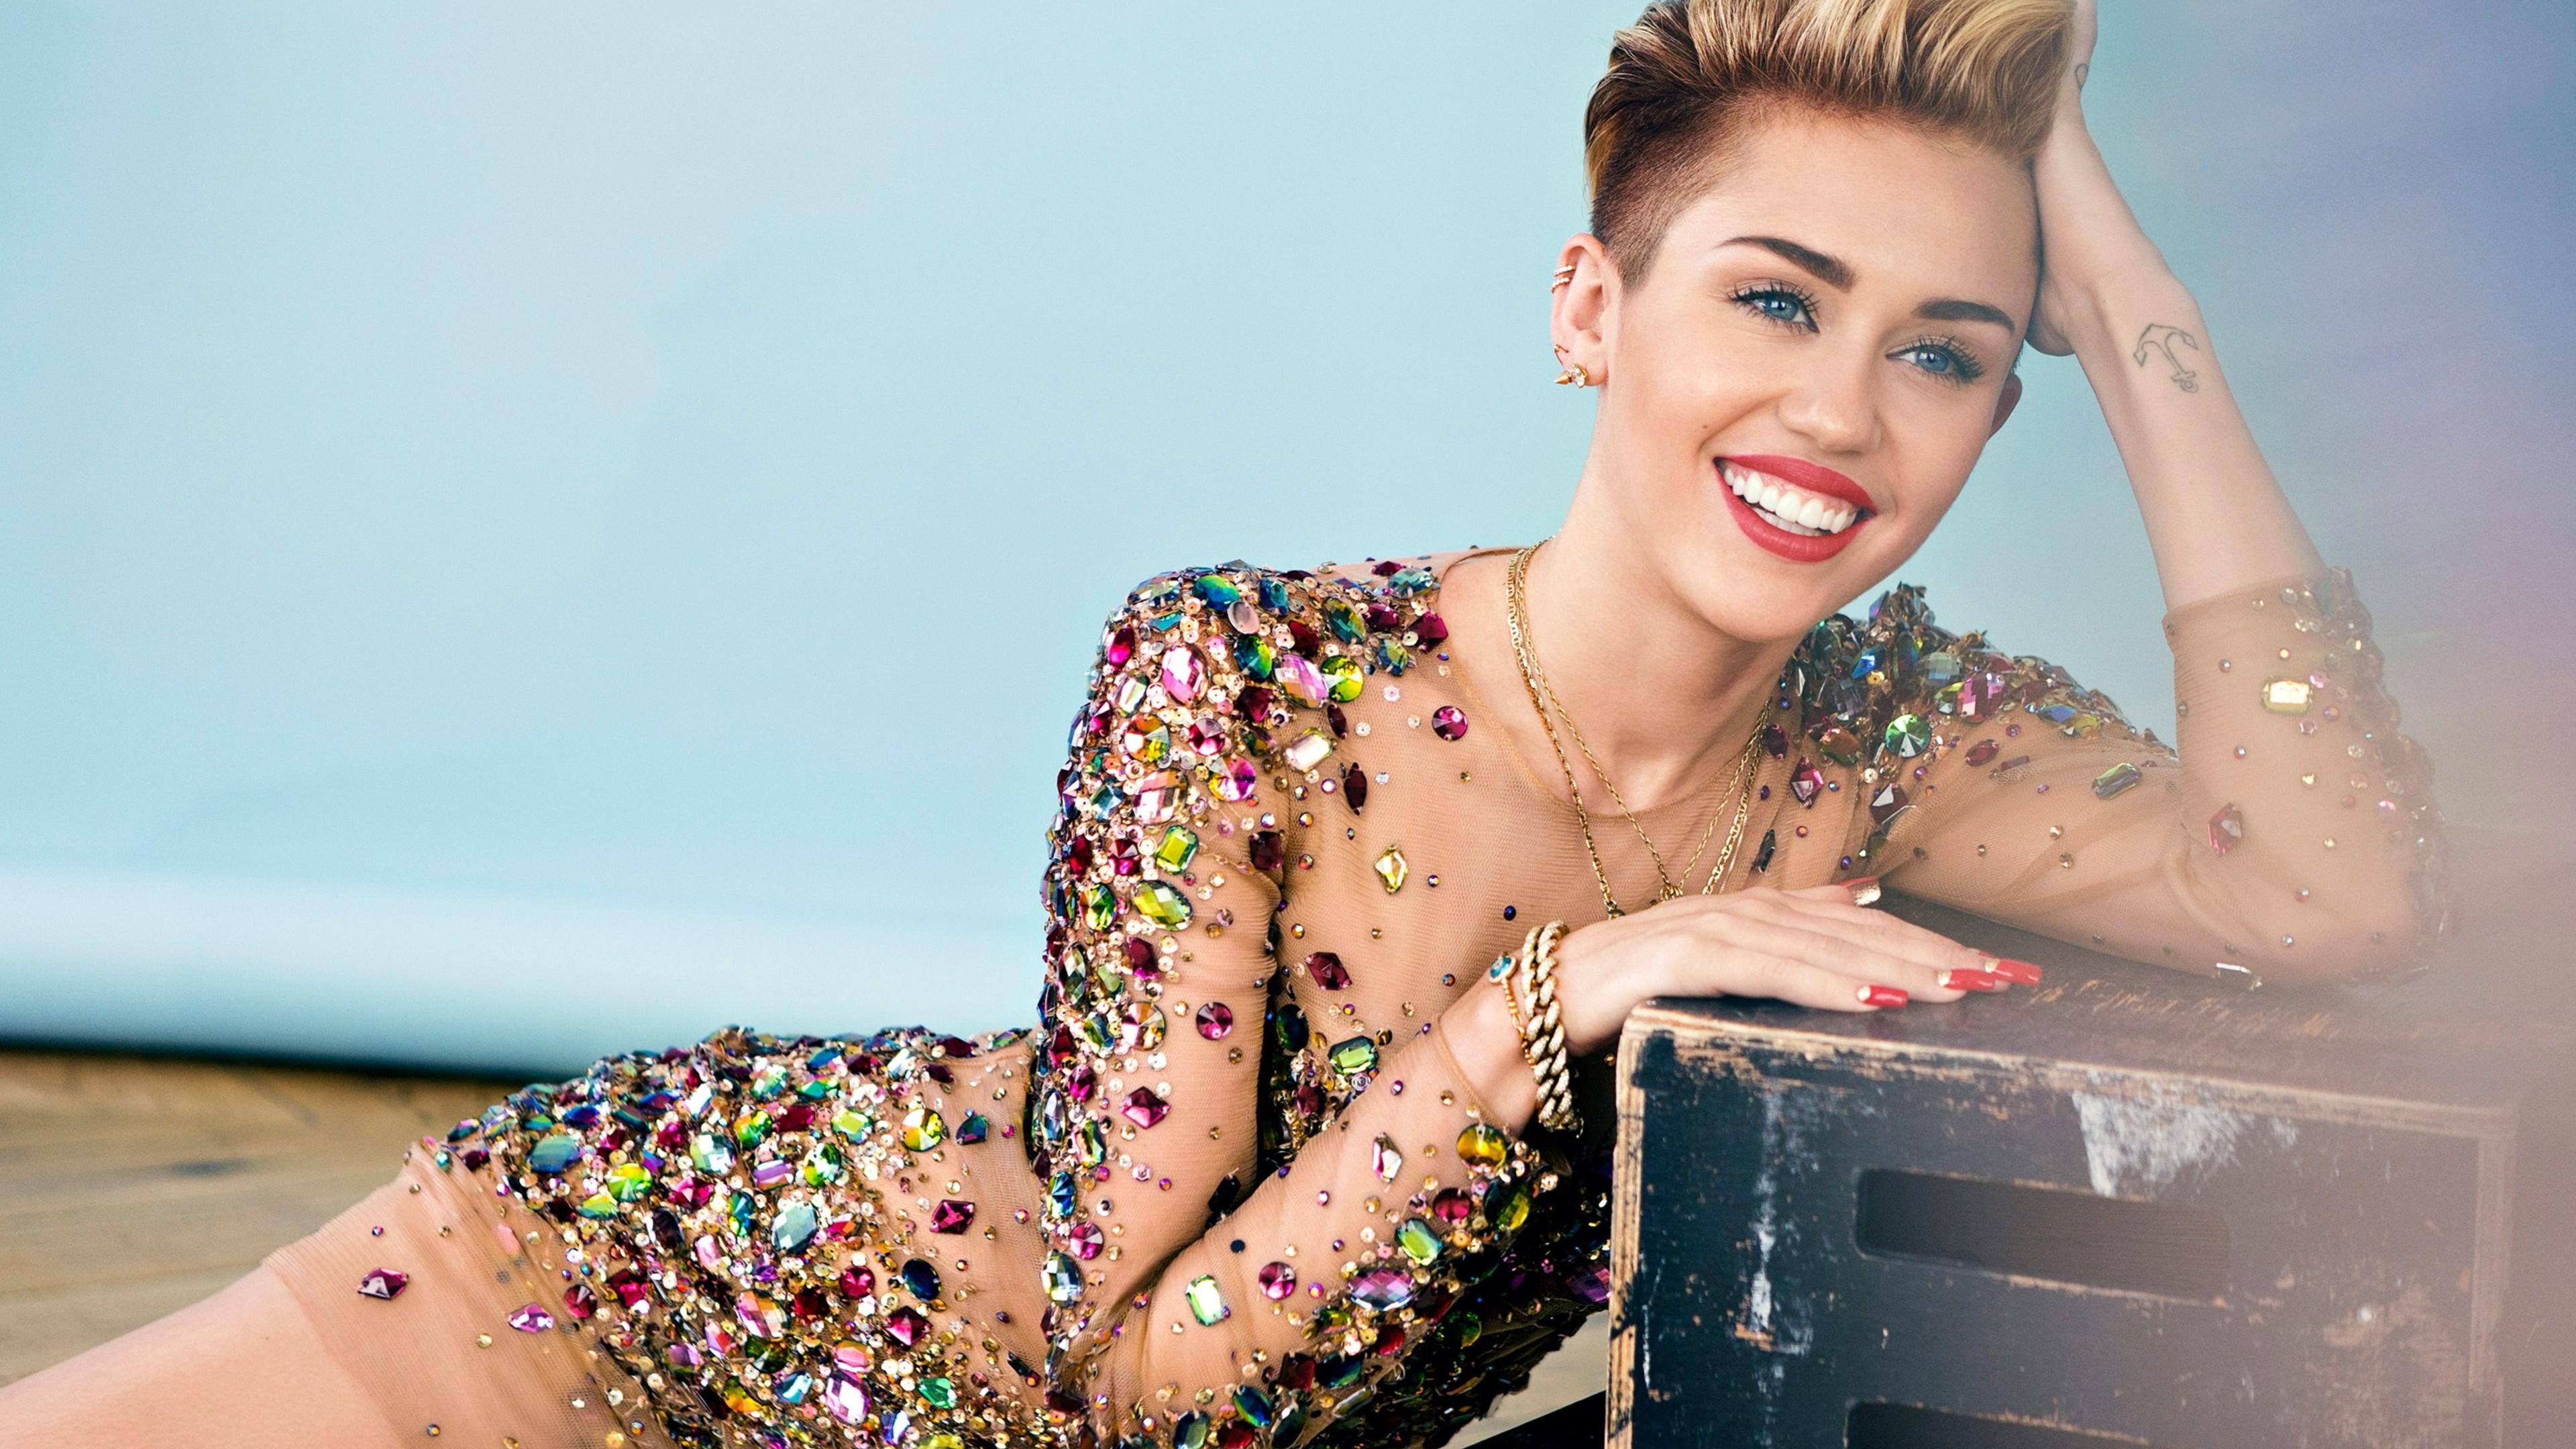 2016 miley cyrus 1536855757 - 2016 Miley Cyrus - singer wallpapers, music wallpapers, miley cyrus wallpapers, girls wallpapers, celebrities wallpapers